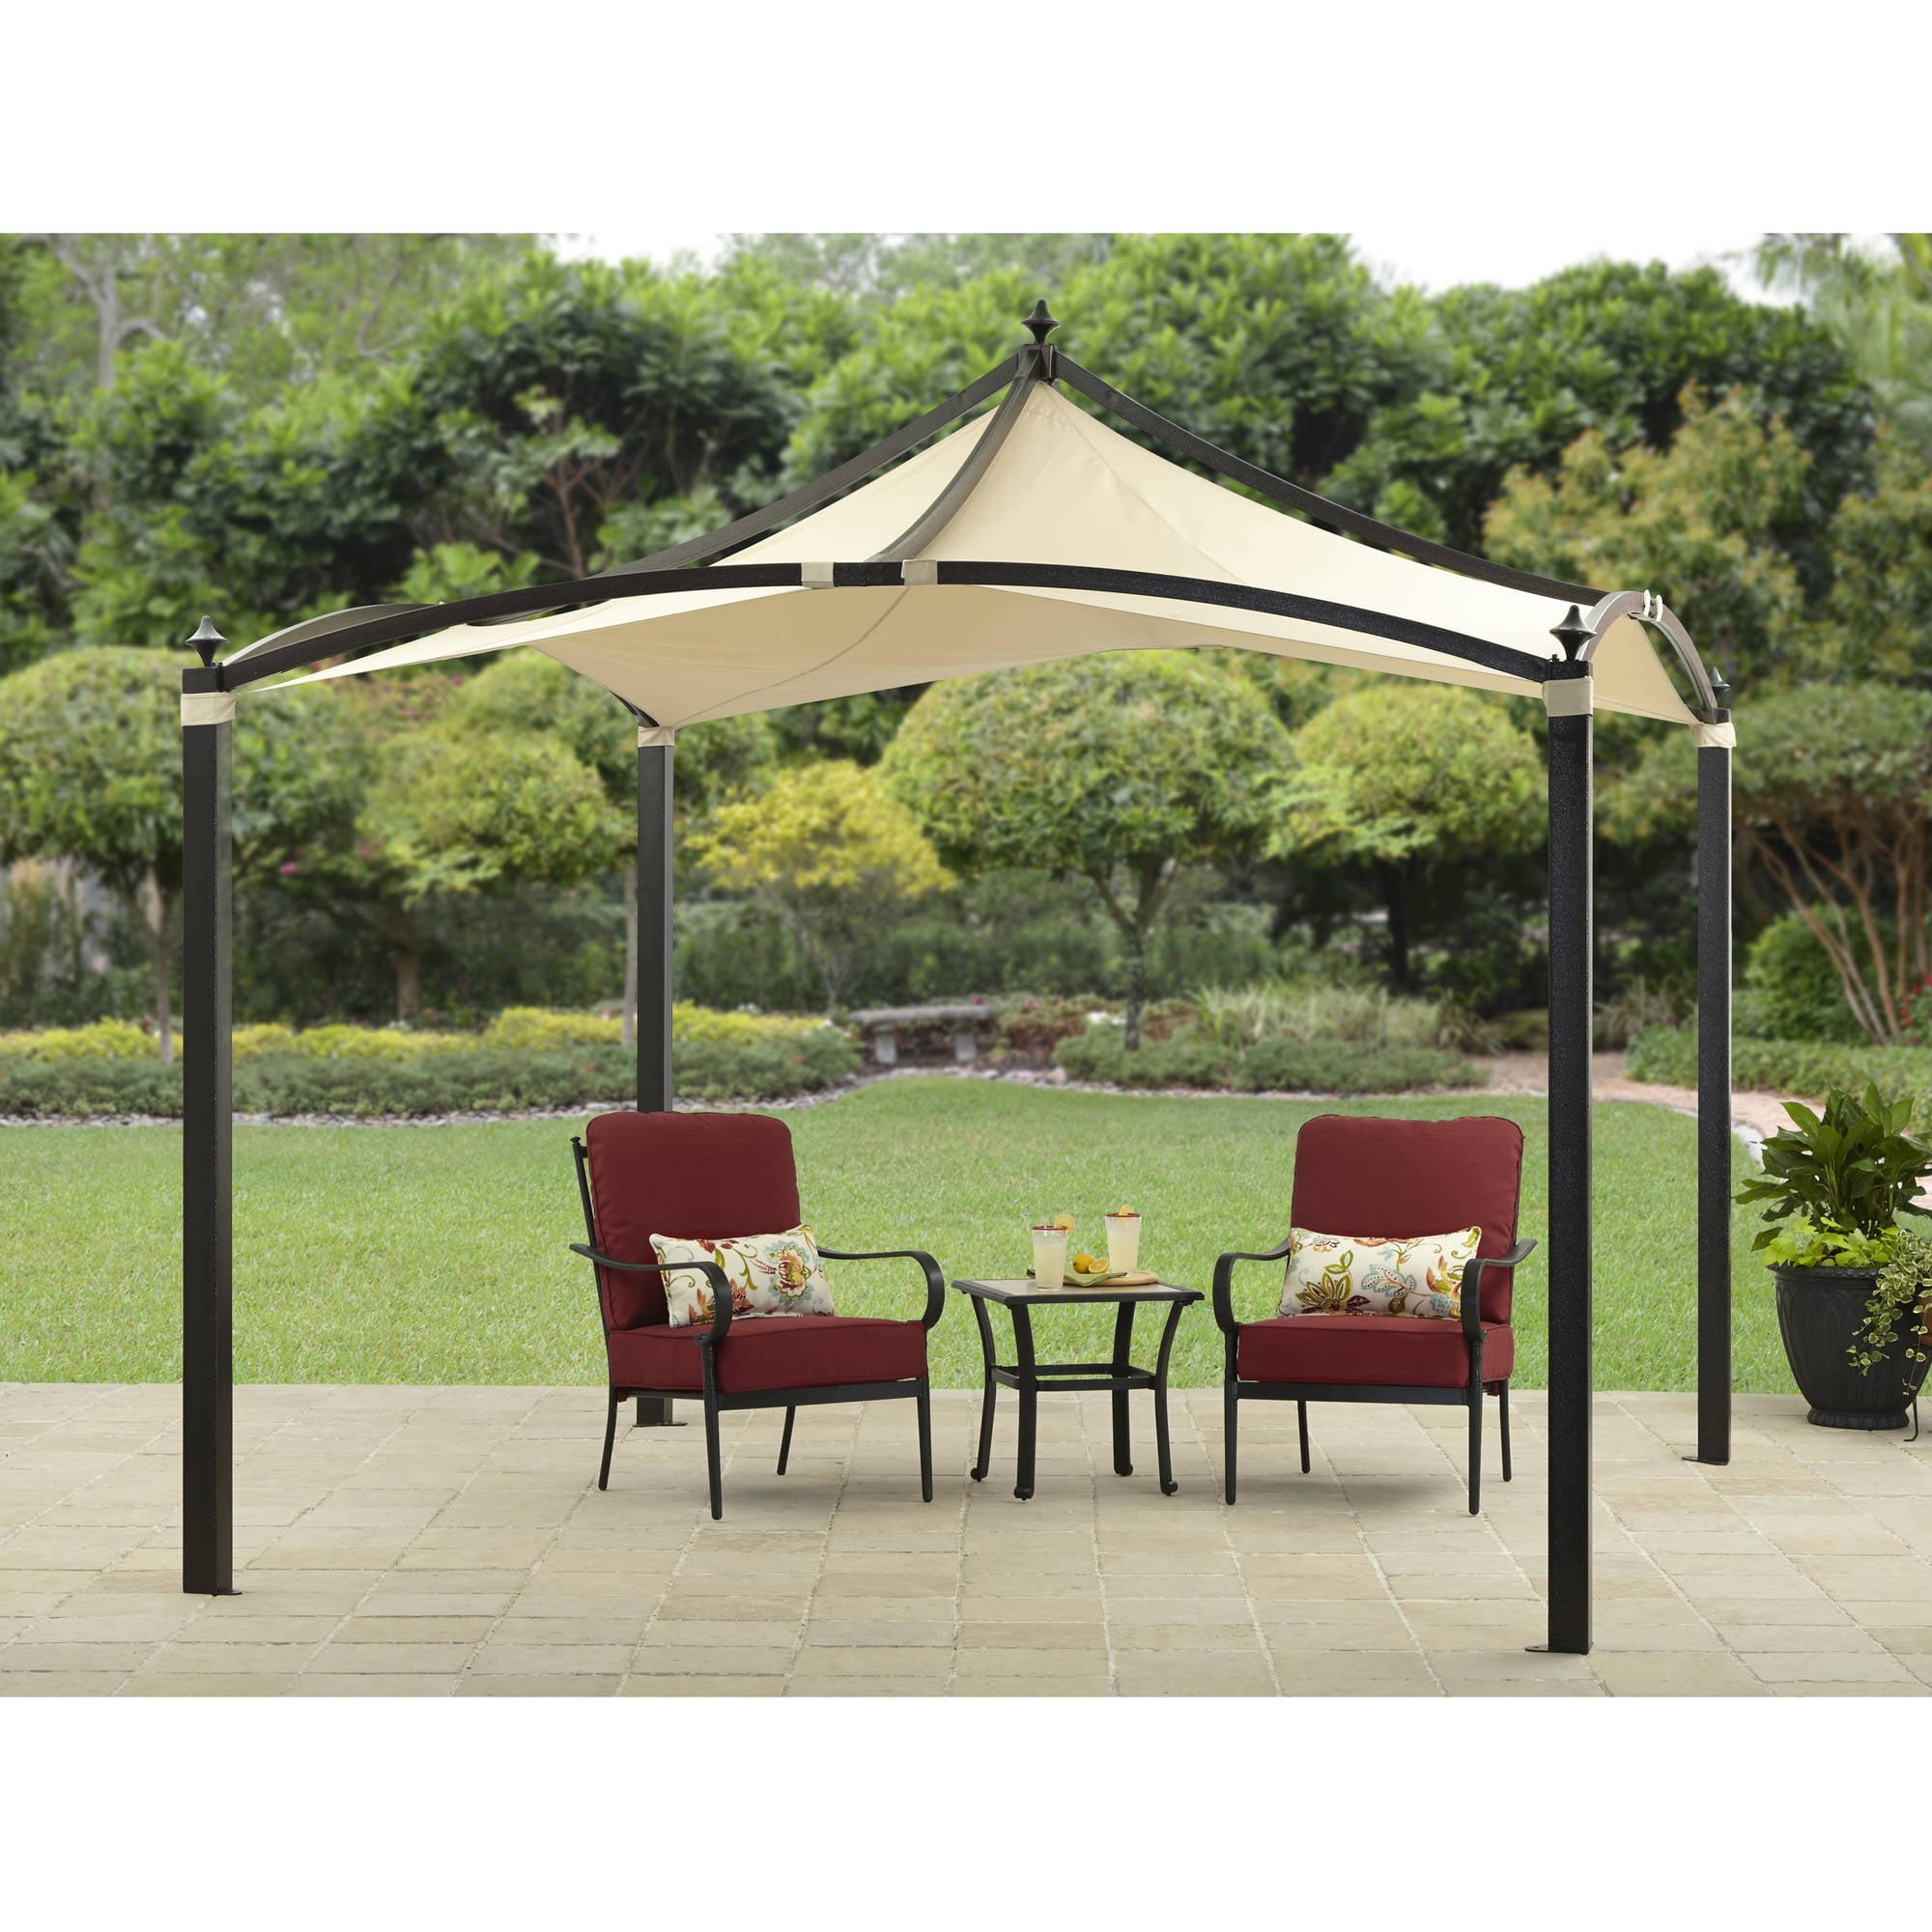 ALEKO GZ6.5X6.5GR Popup Gazebo Canopy Patio Coffee Shelter 6.5 x 6.5 Feet Green